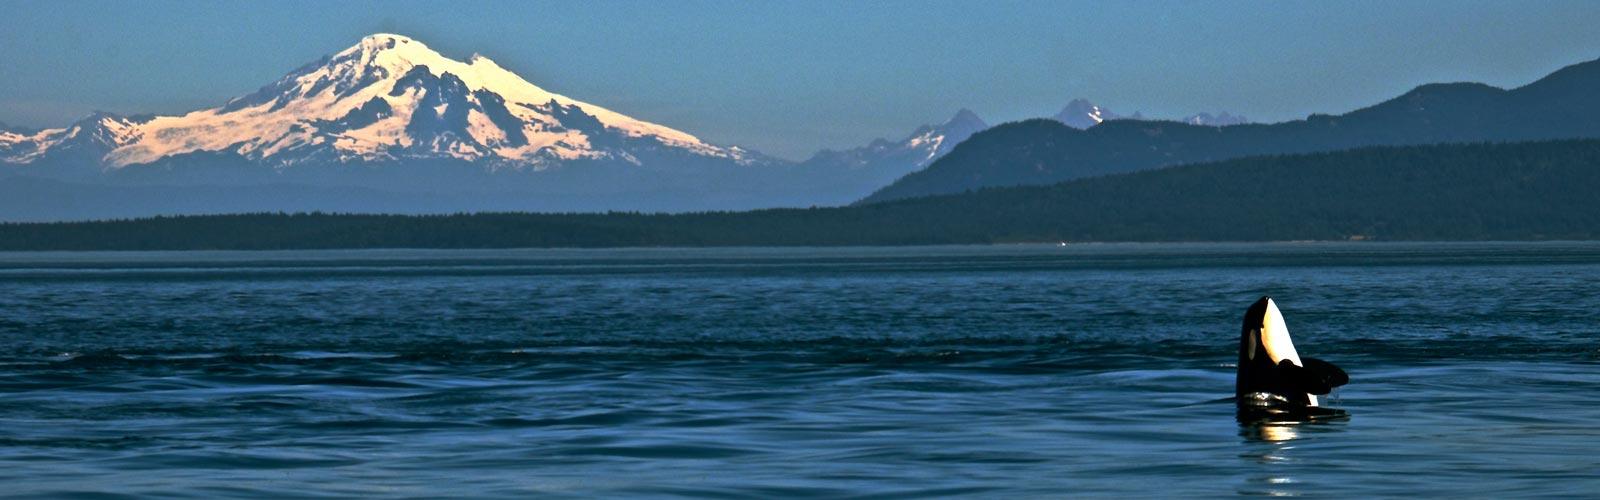 11.-san-juan-islands-orcas_2.jpg